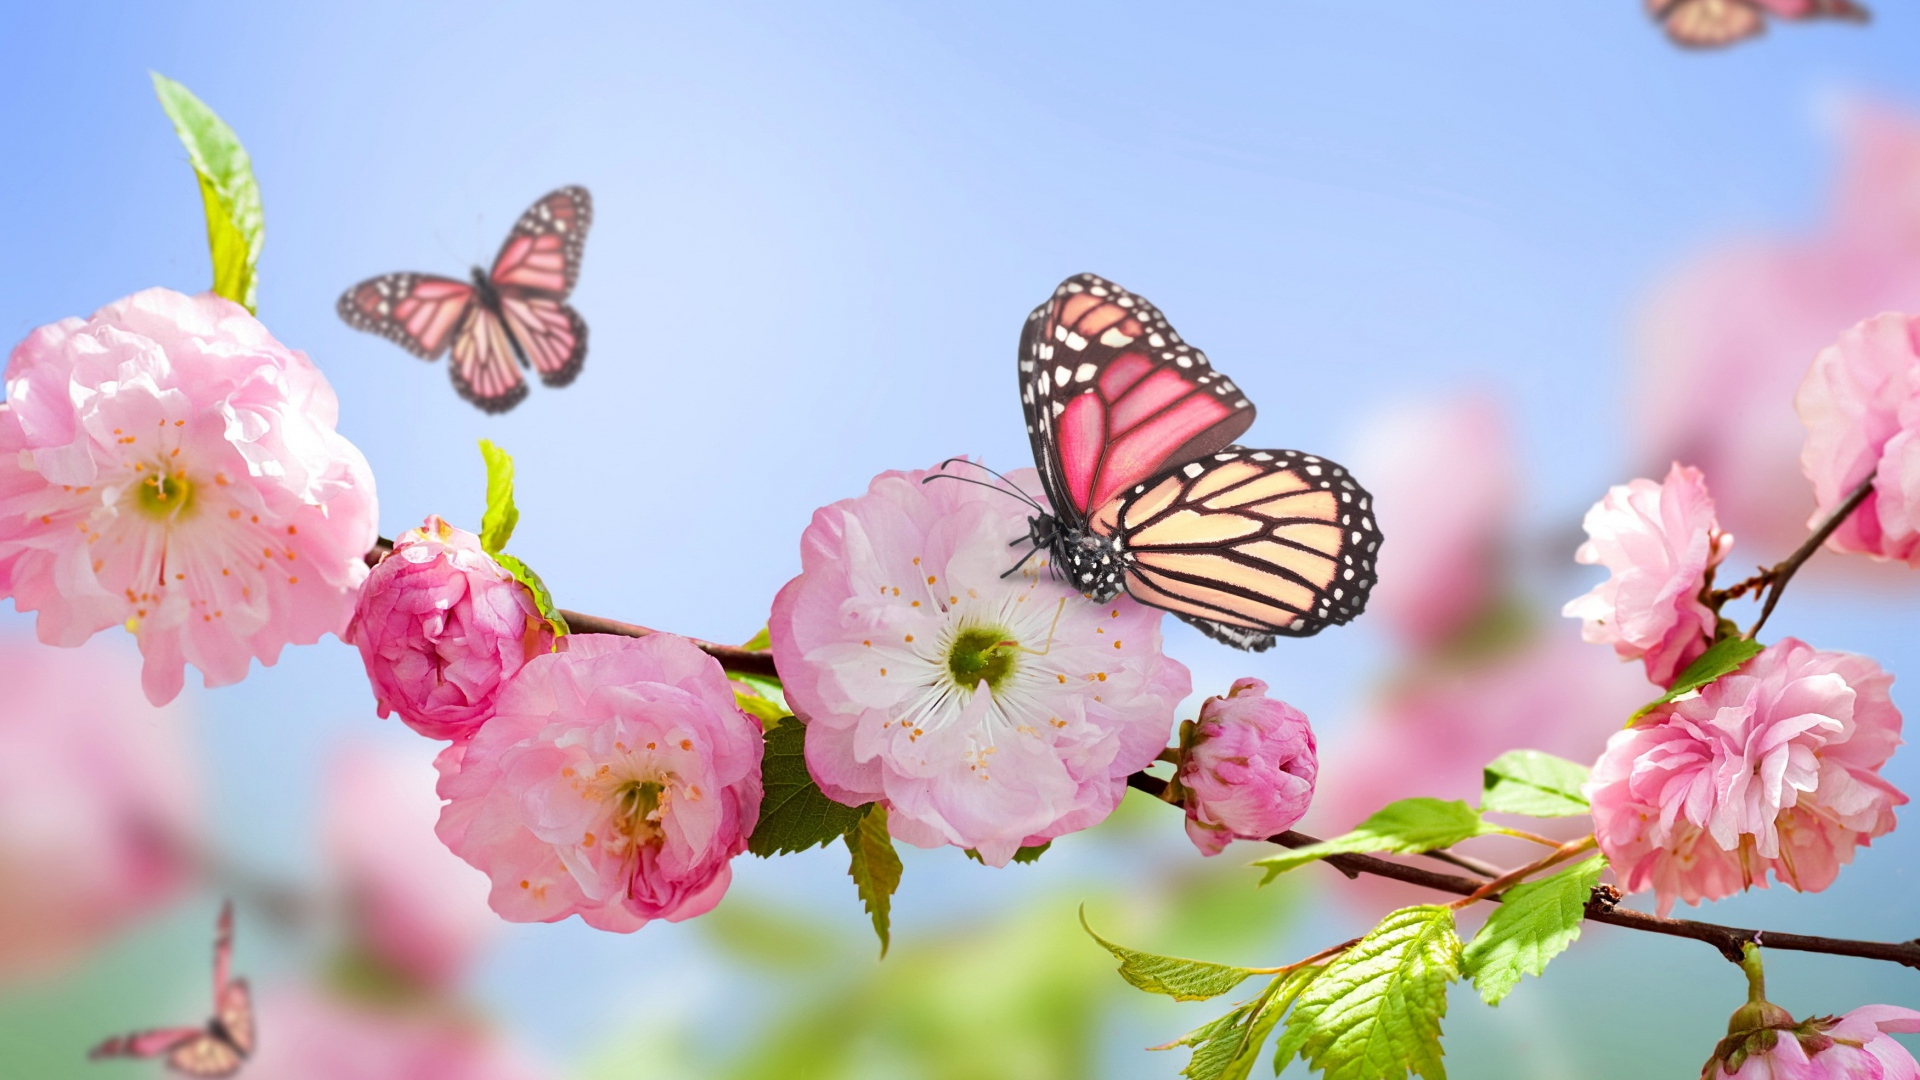 صور صور خلفيات ورد , اجمل صور خلفيات ورد وزهور مميزة